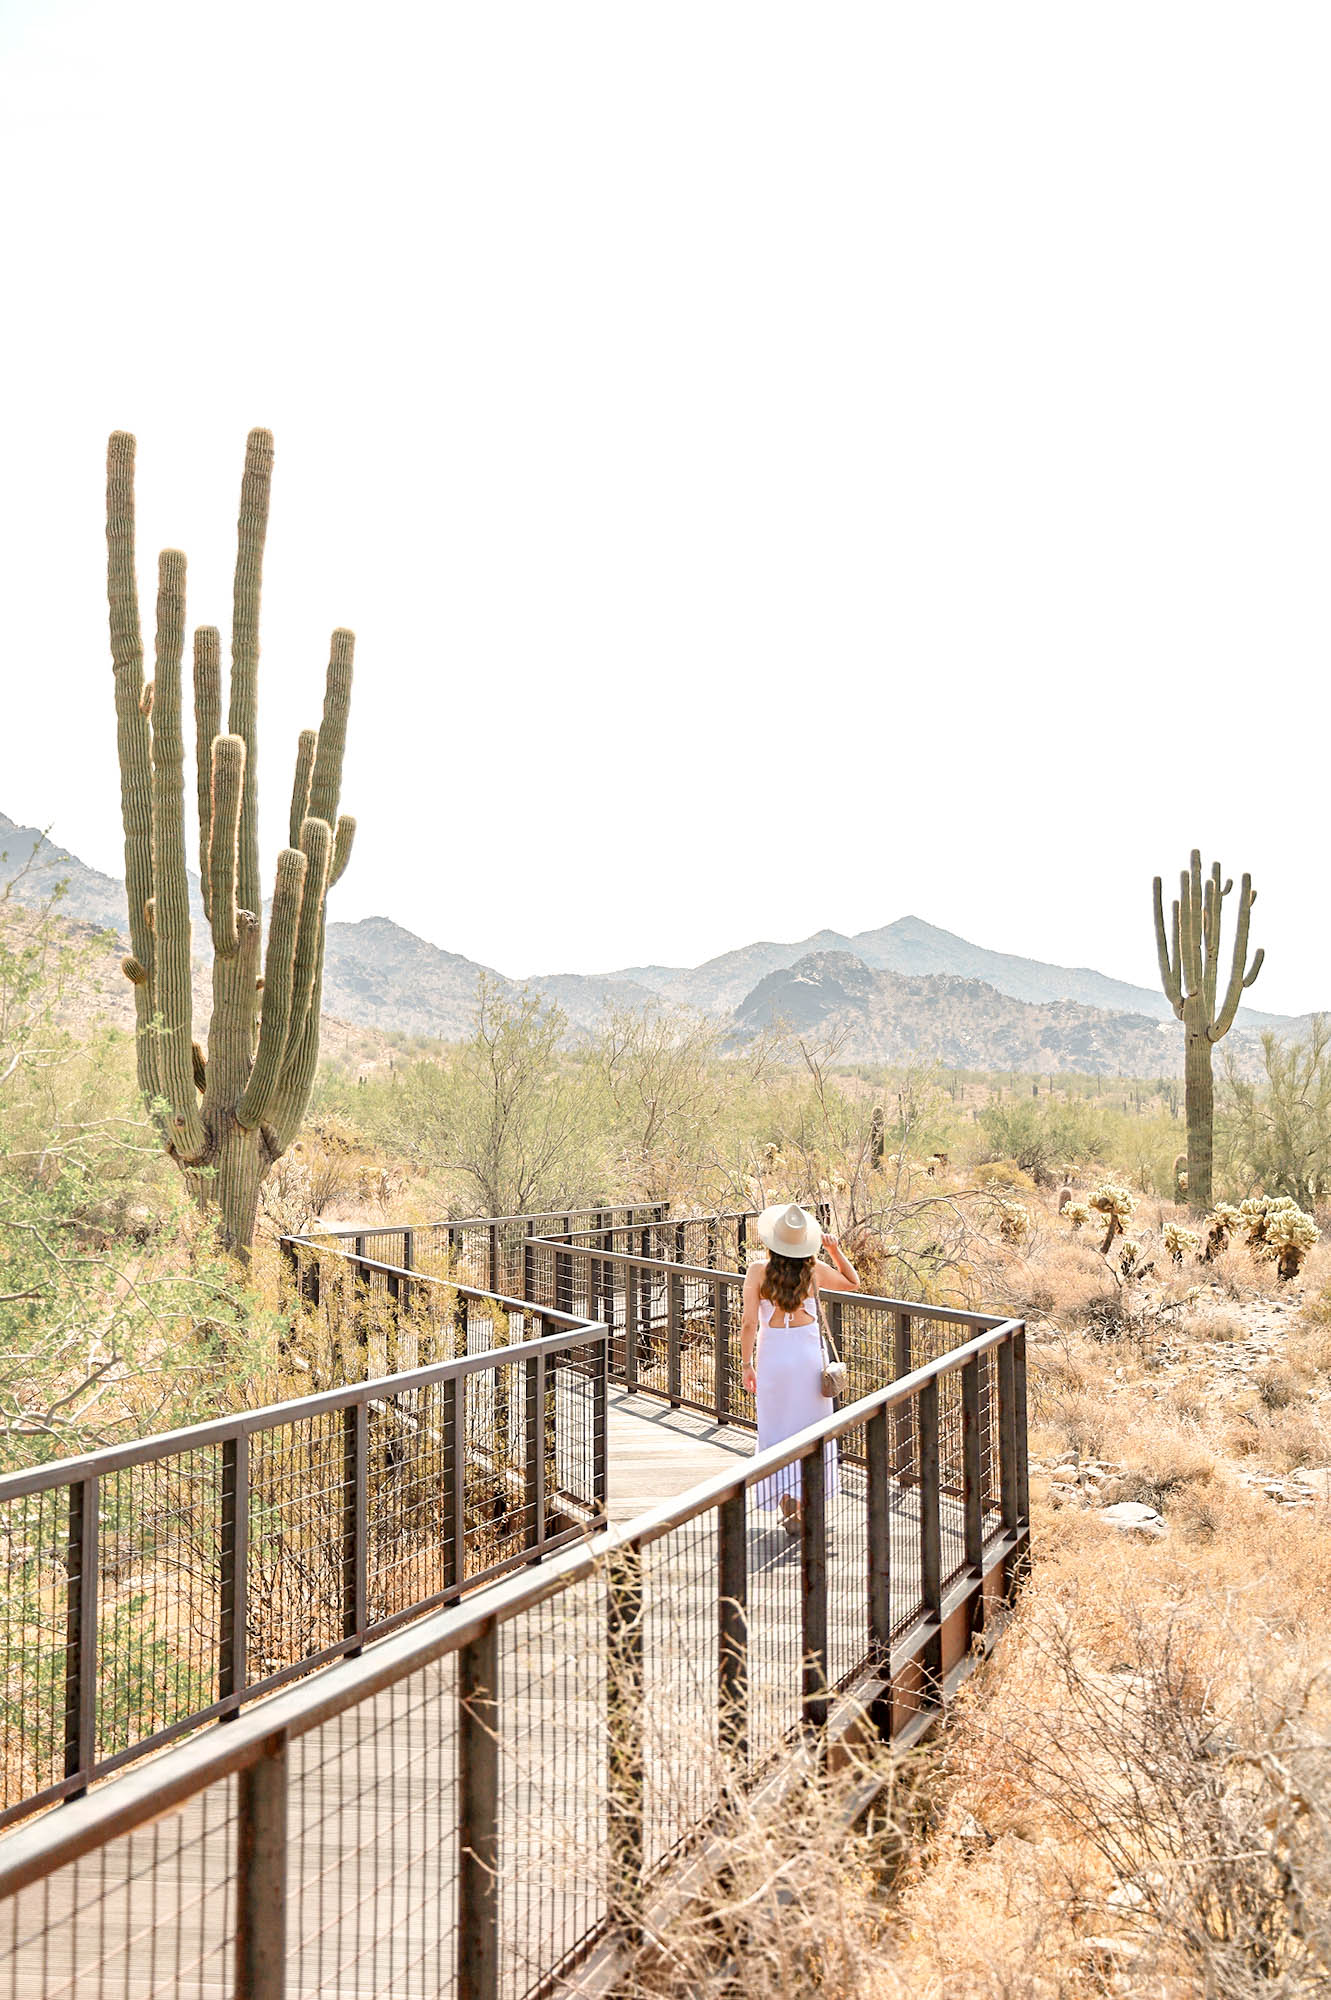 A Weekend Guide to Scottsdale, Arizona